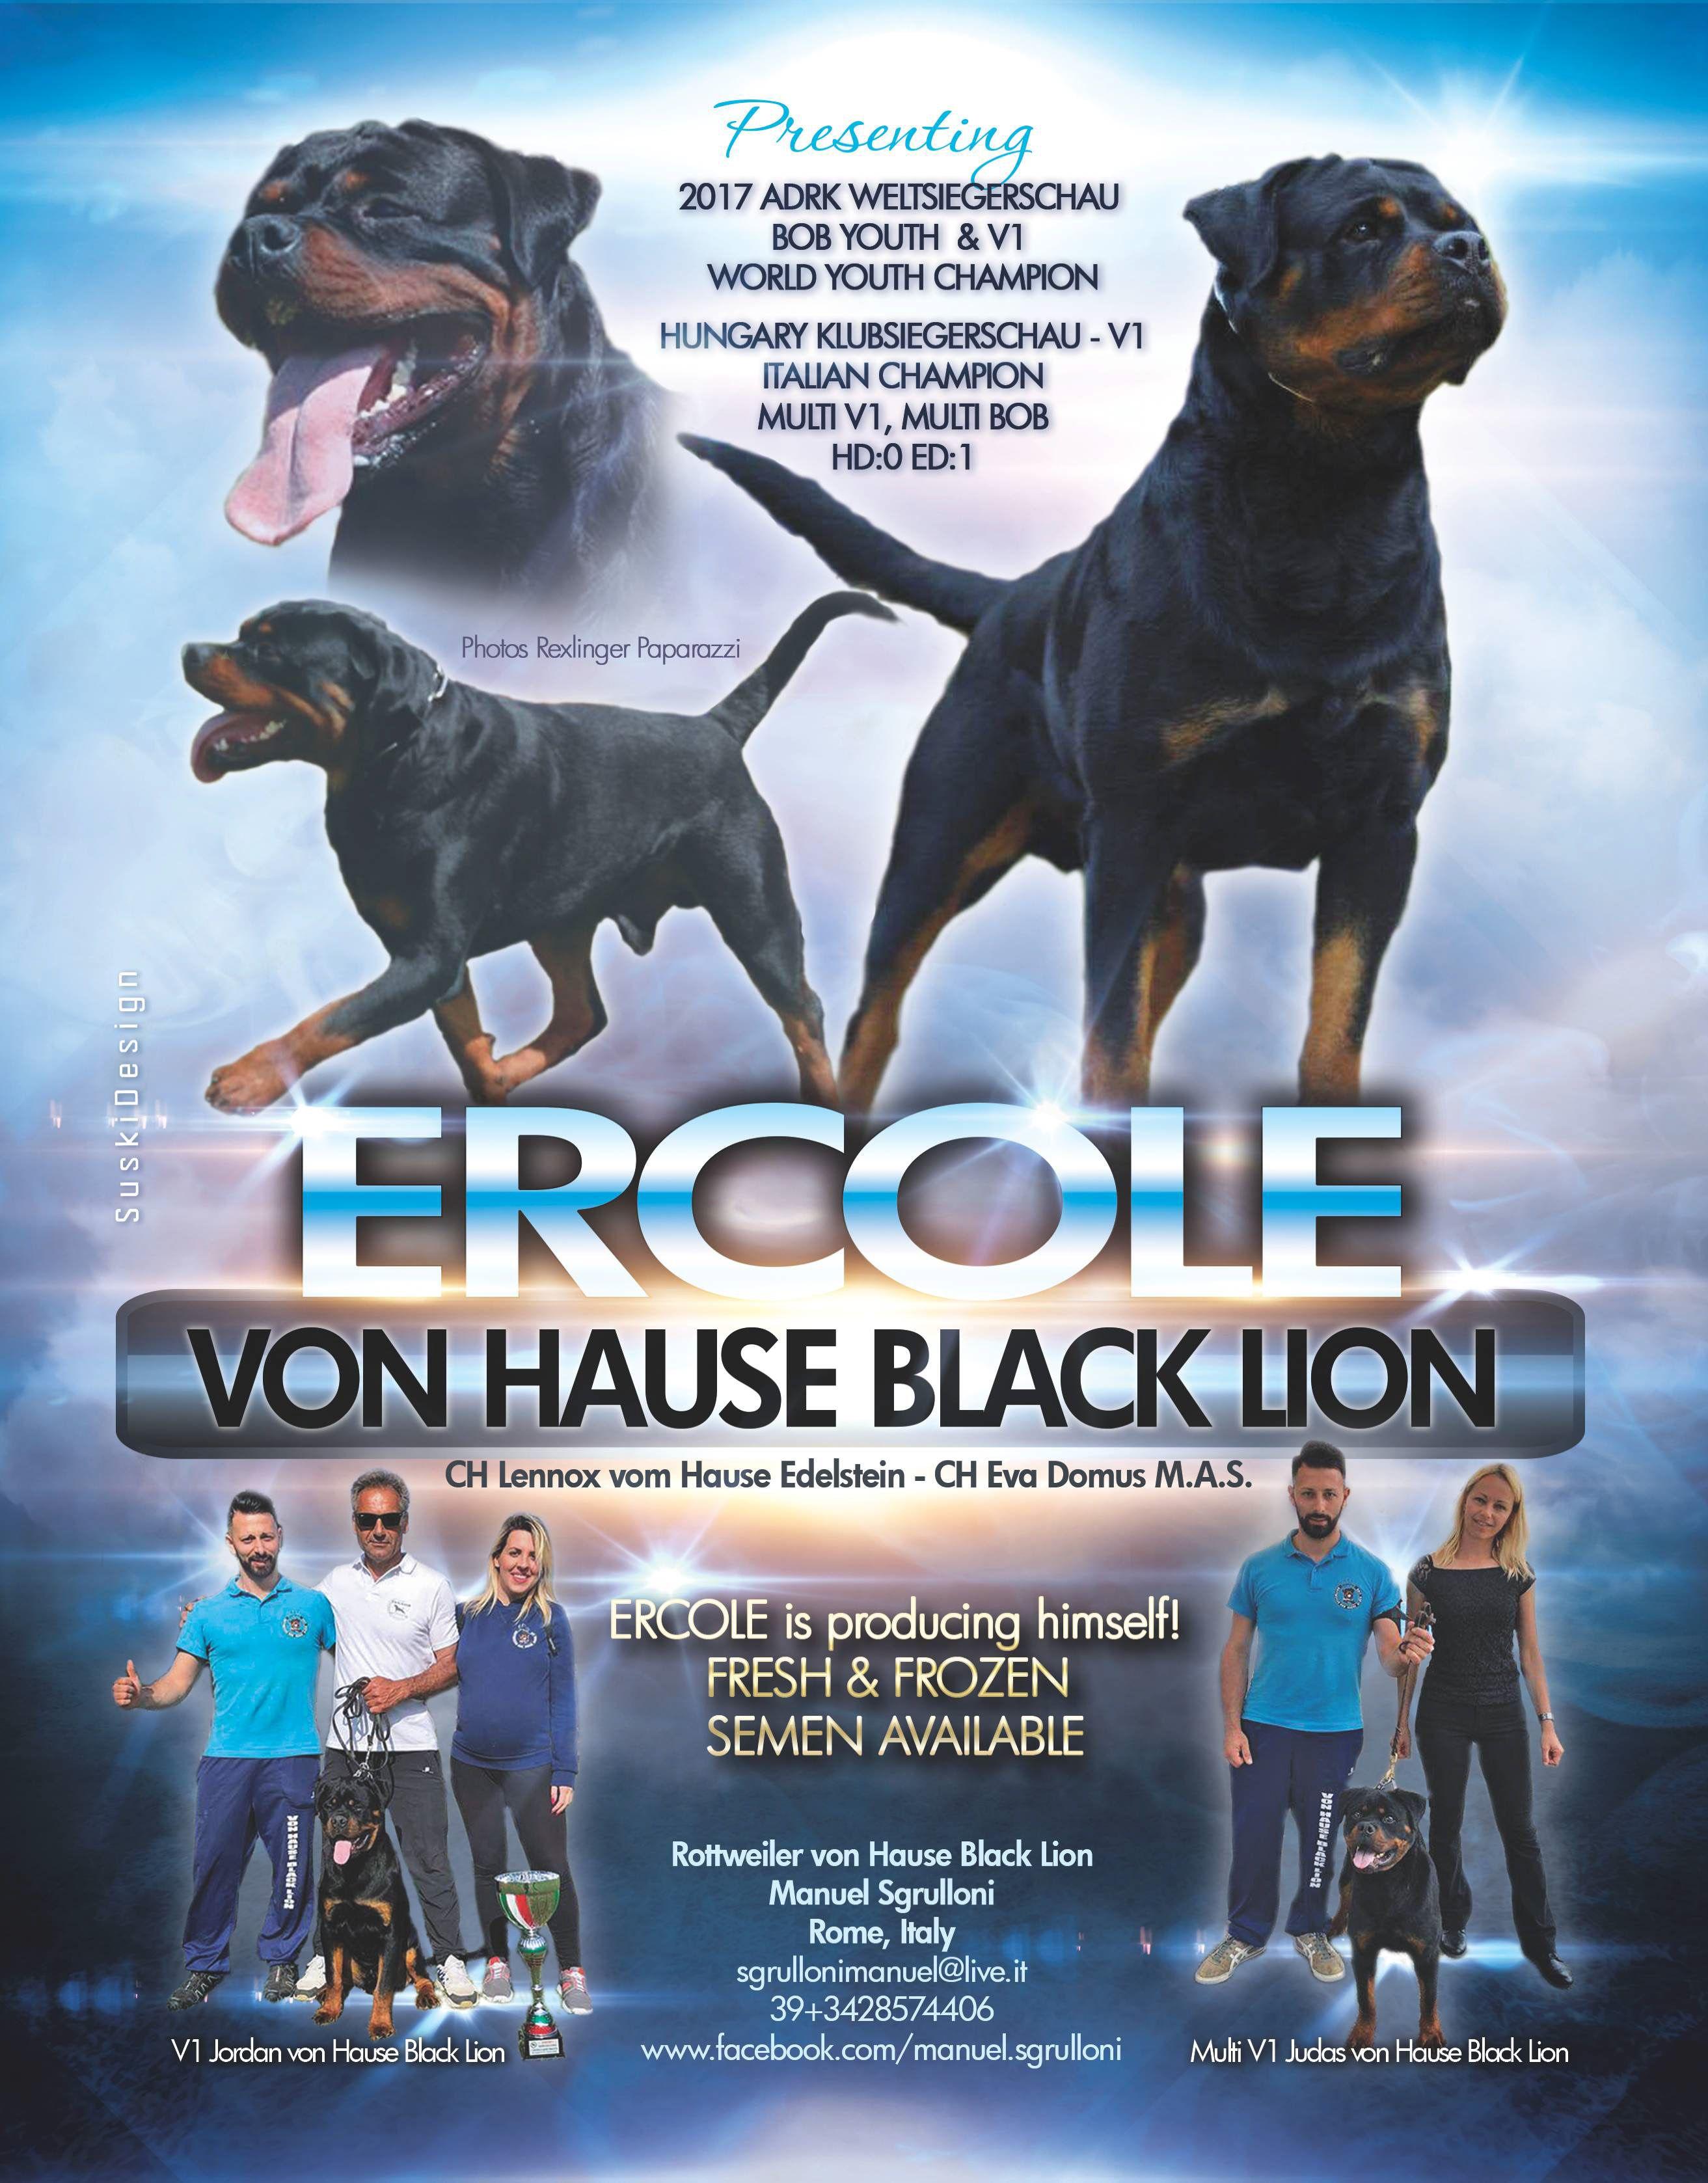 Rottweiler Von House Black Lion Manuel Sgrulloni Rome Italy